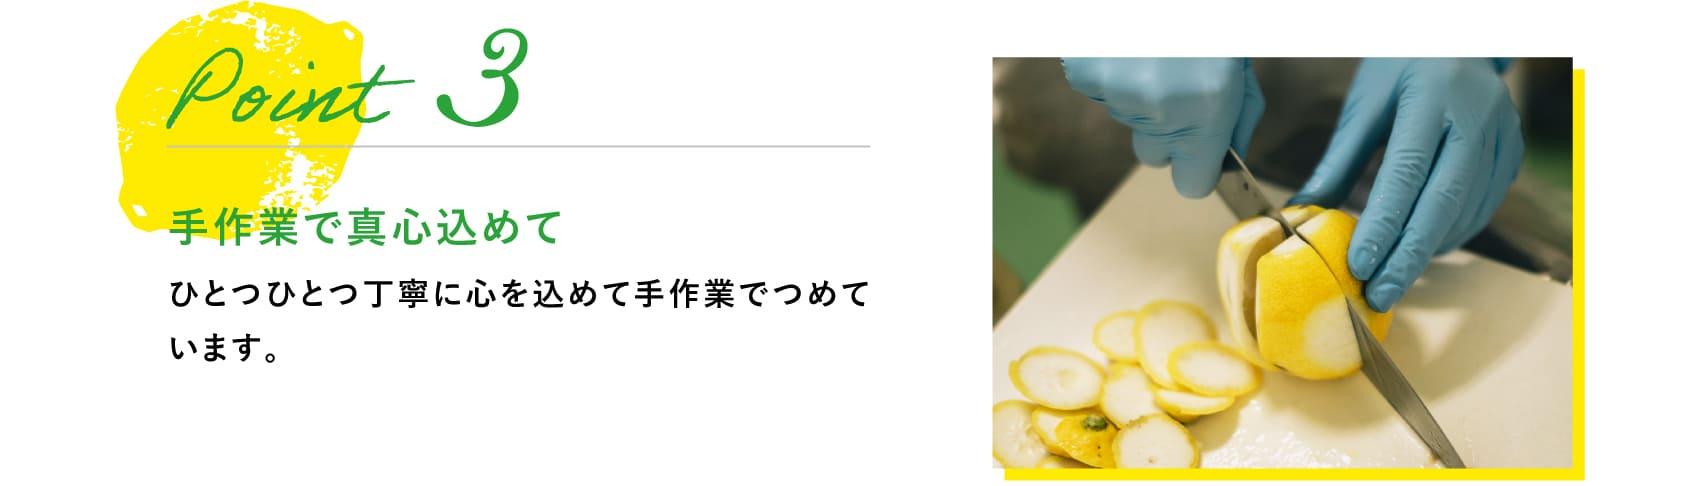 pc用レモン切る